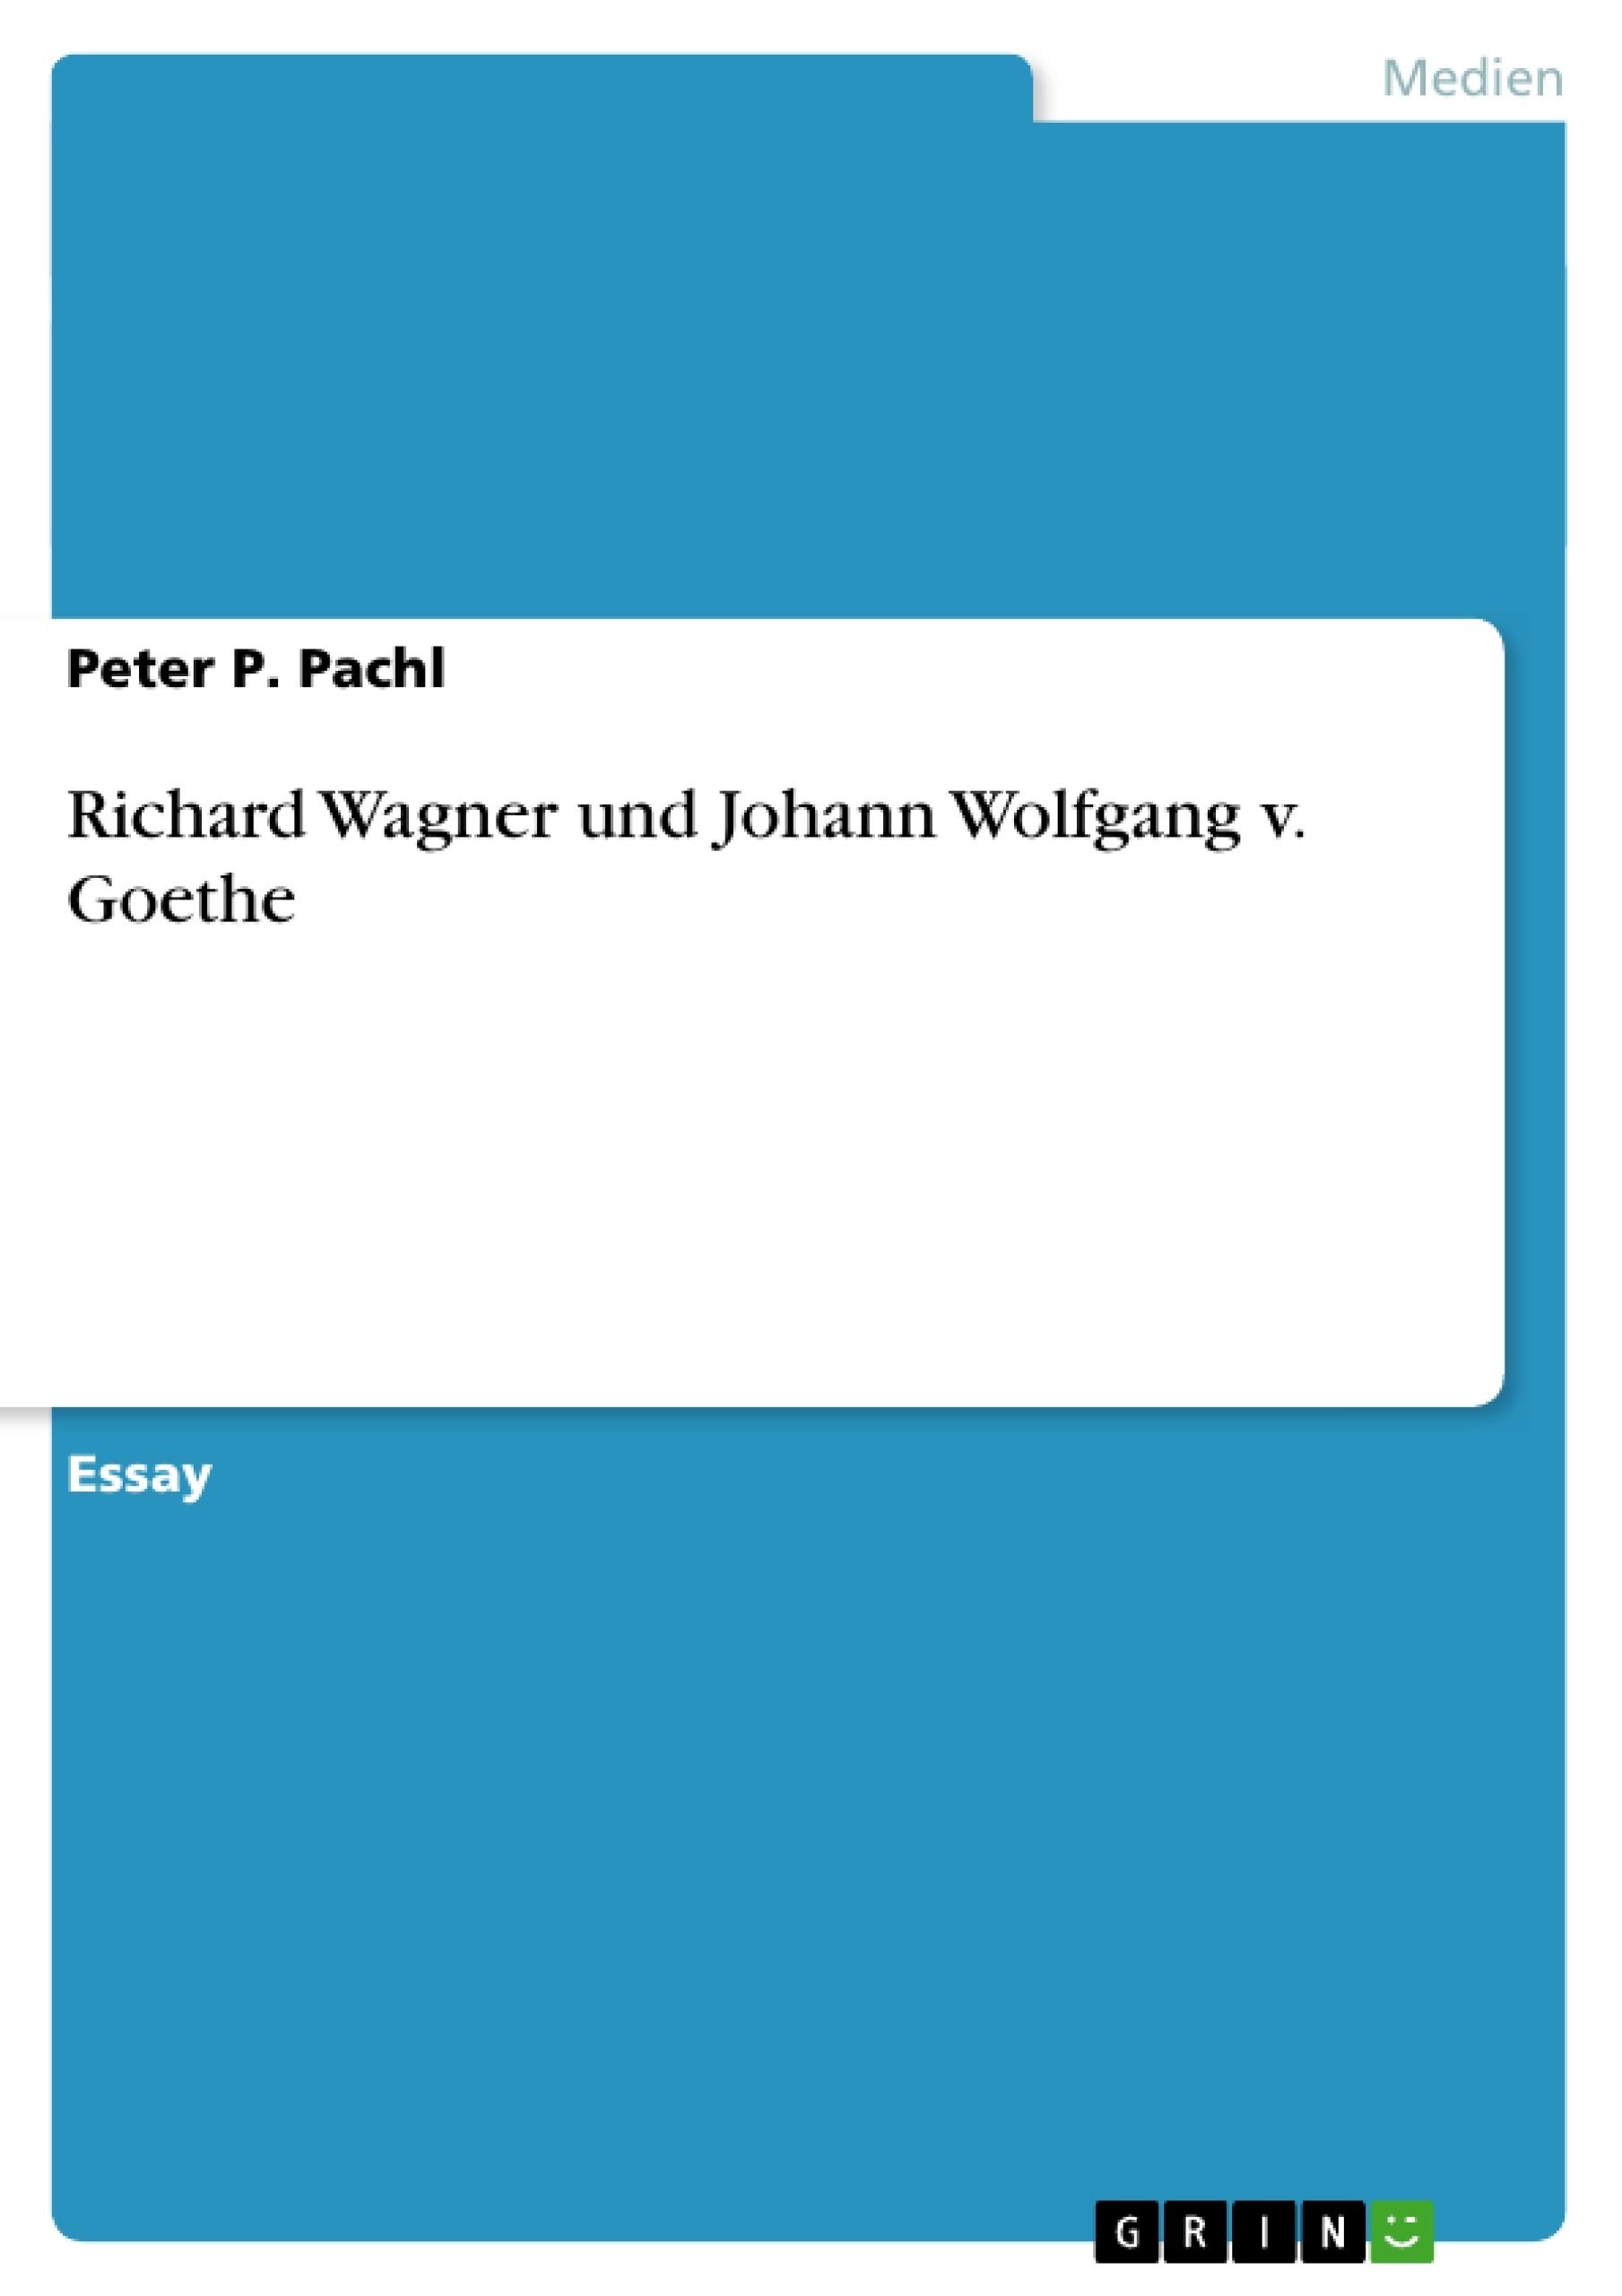 Titel: Richard Wagner  und Johann Wolfgang v. Goethe